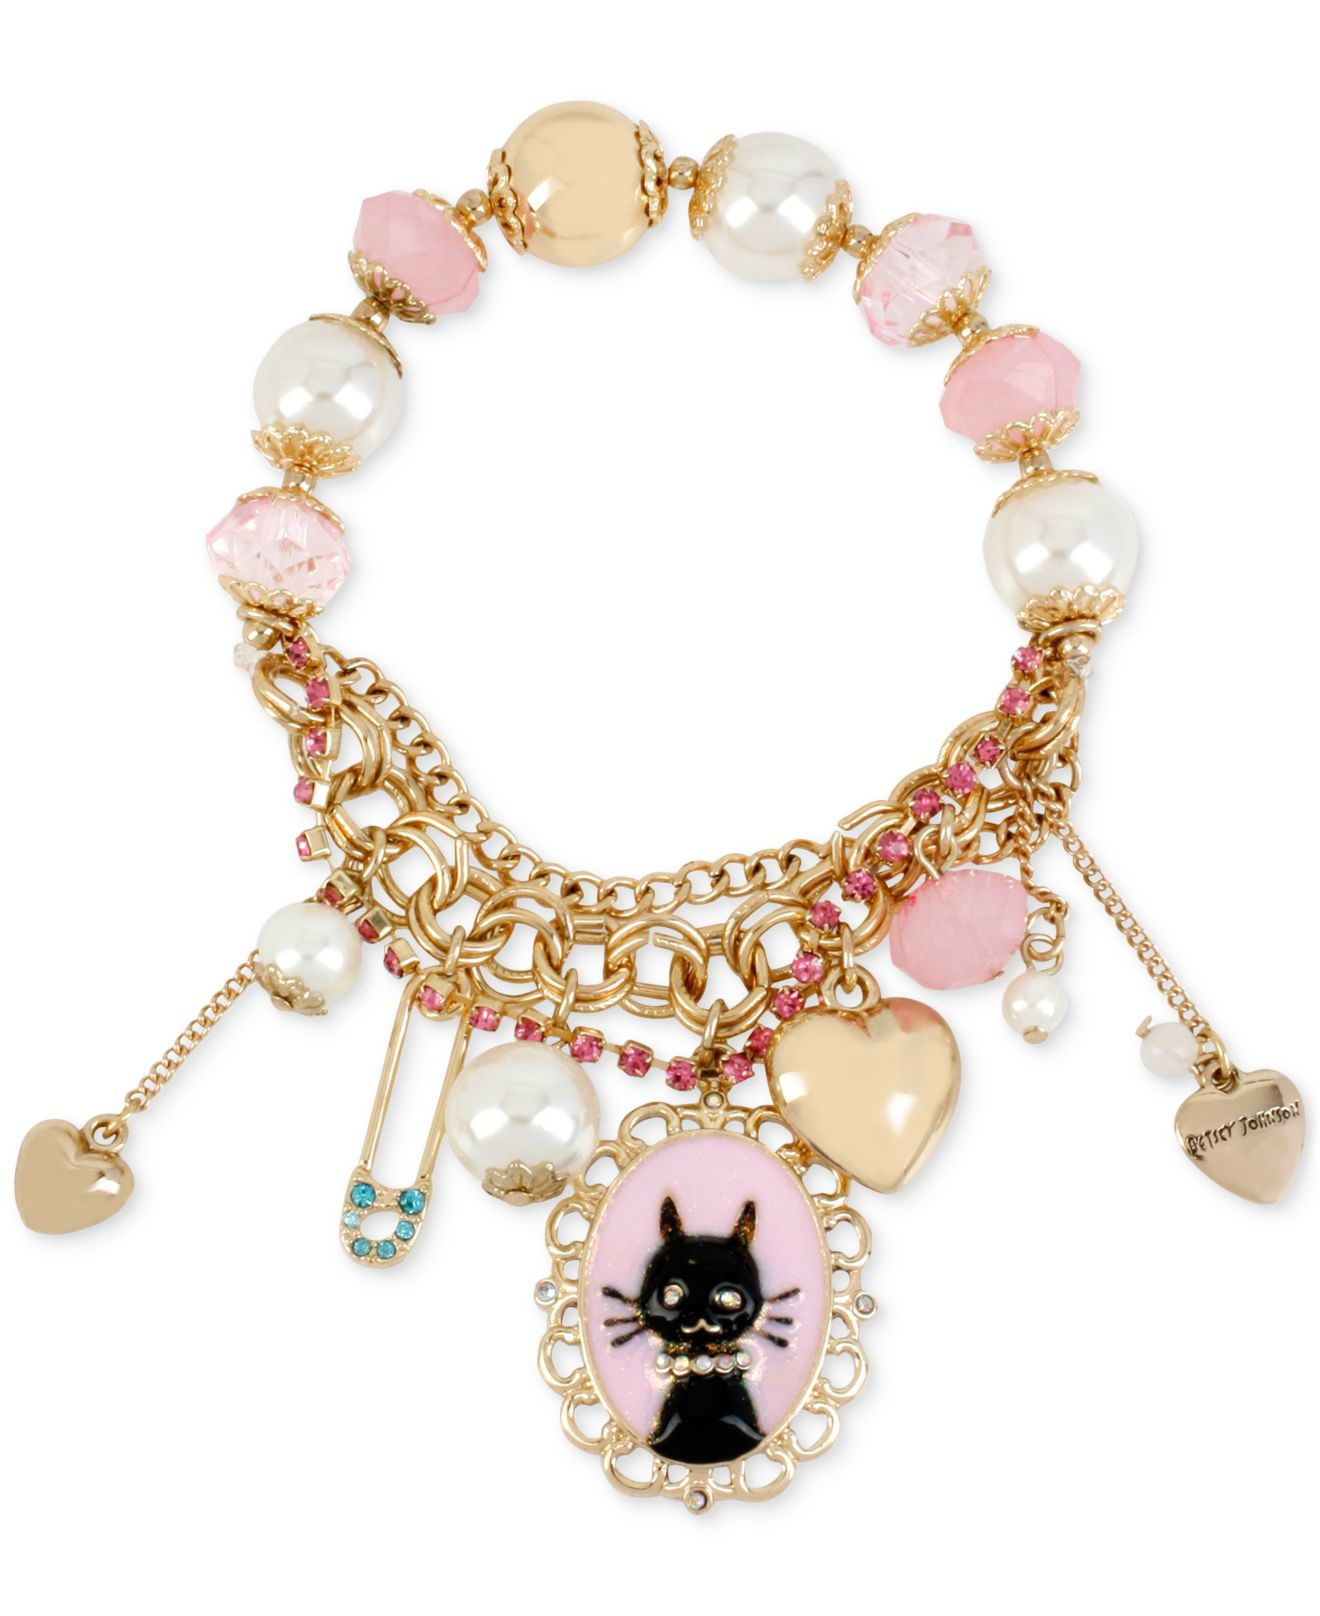 Betsey Johnson Charm Bracelet - Best Bracelet 2018